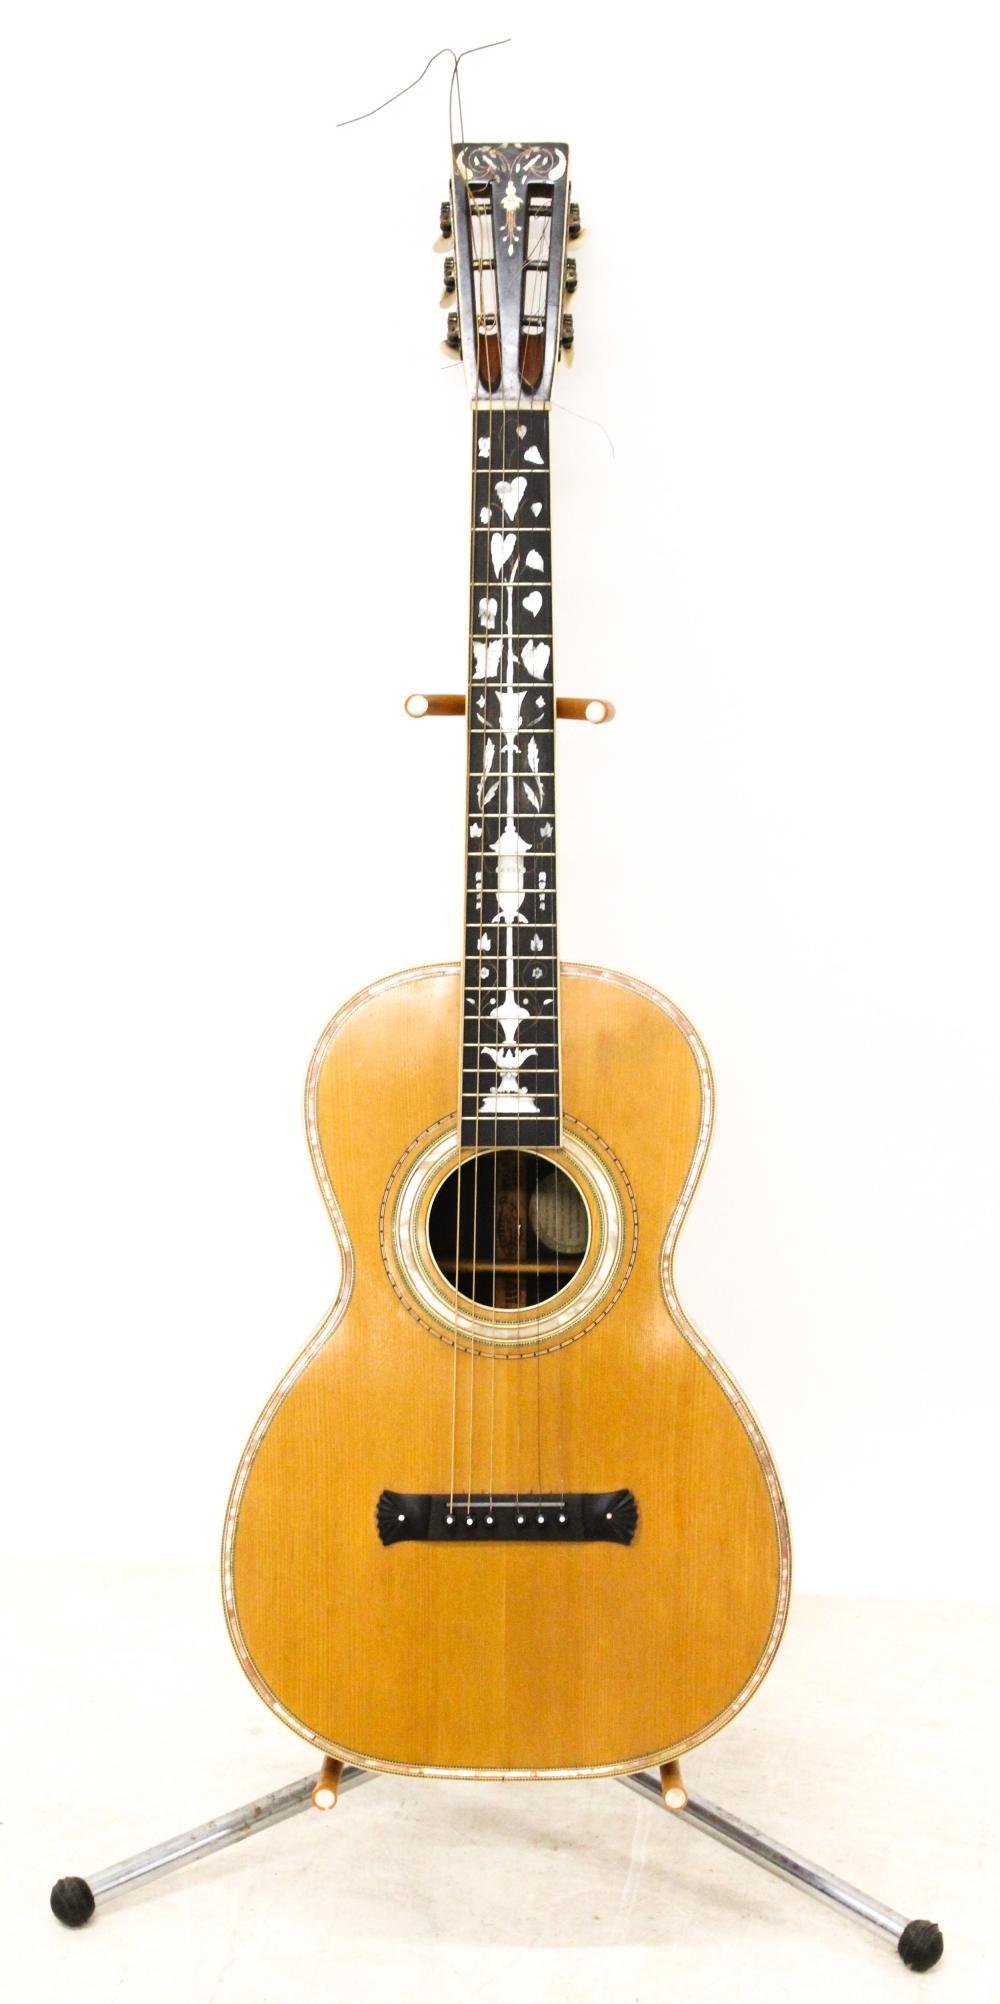 1910 Washburn Parlor Guitar